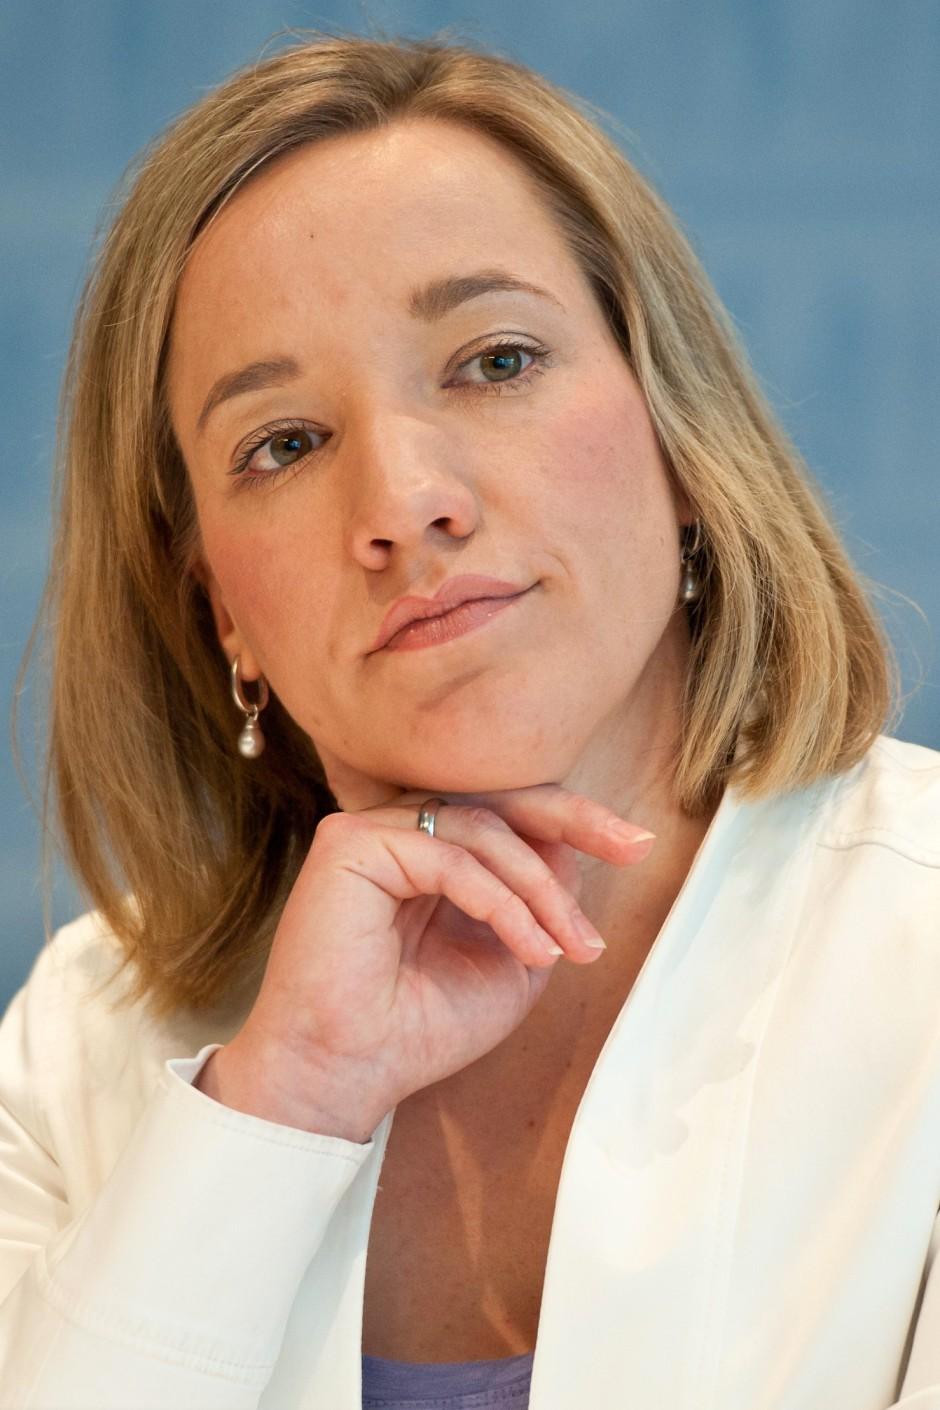 dpa. Kristina Schröder